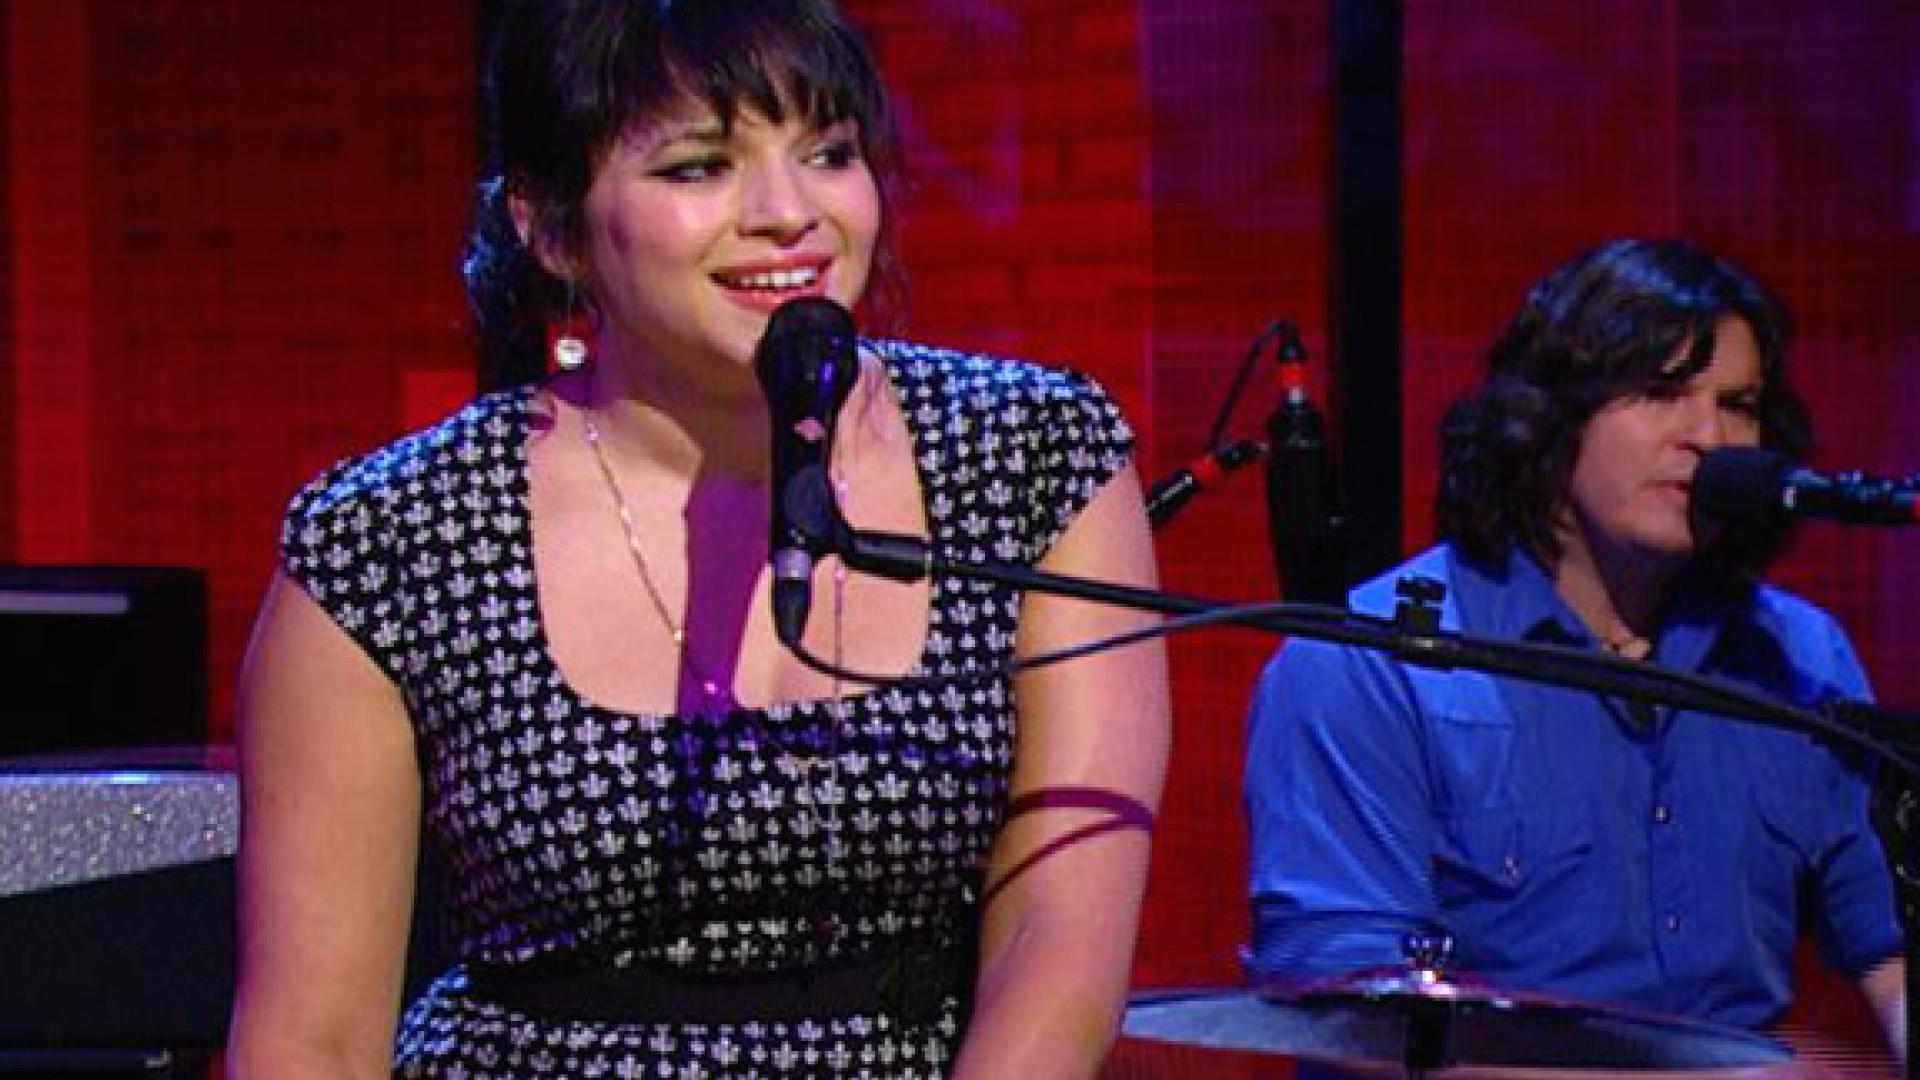 Norah Jones Performs | Rachael Ray Show